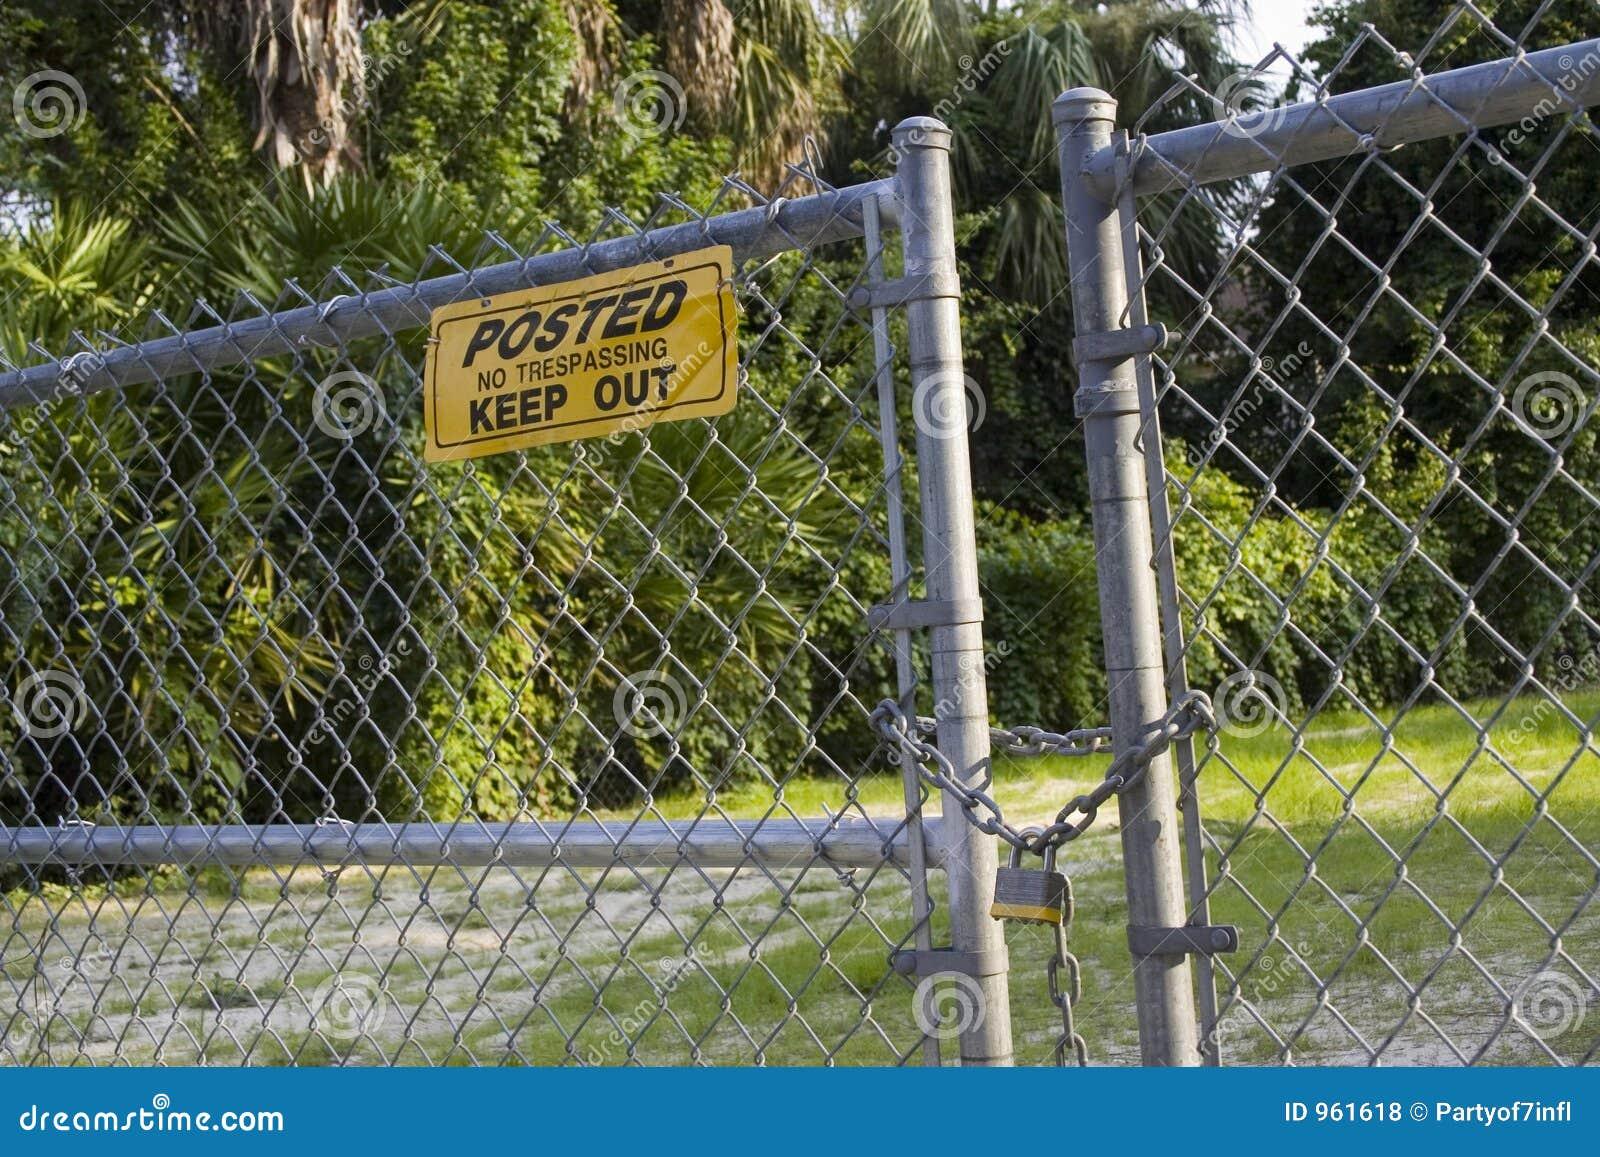 broken fence warning announcement - photo #37